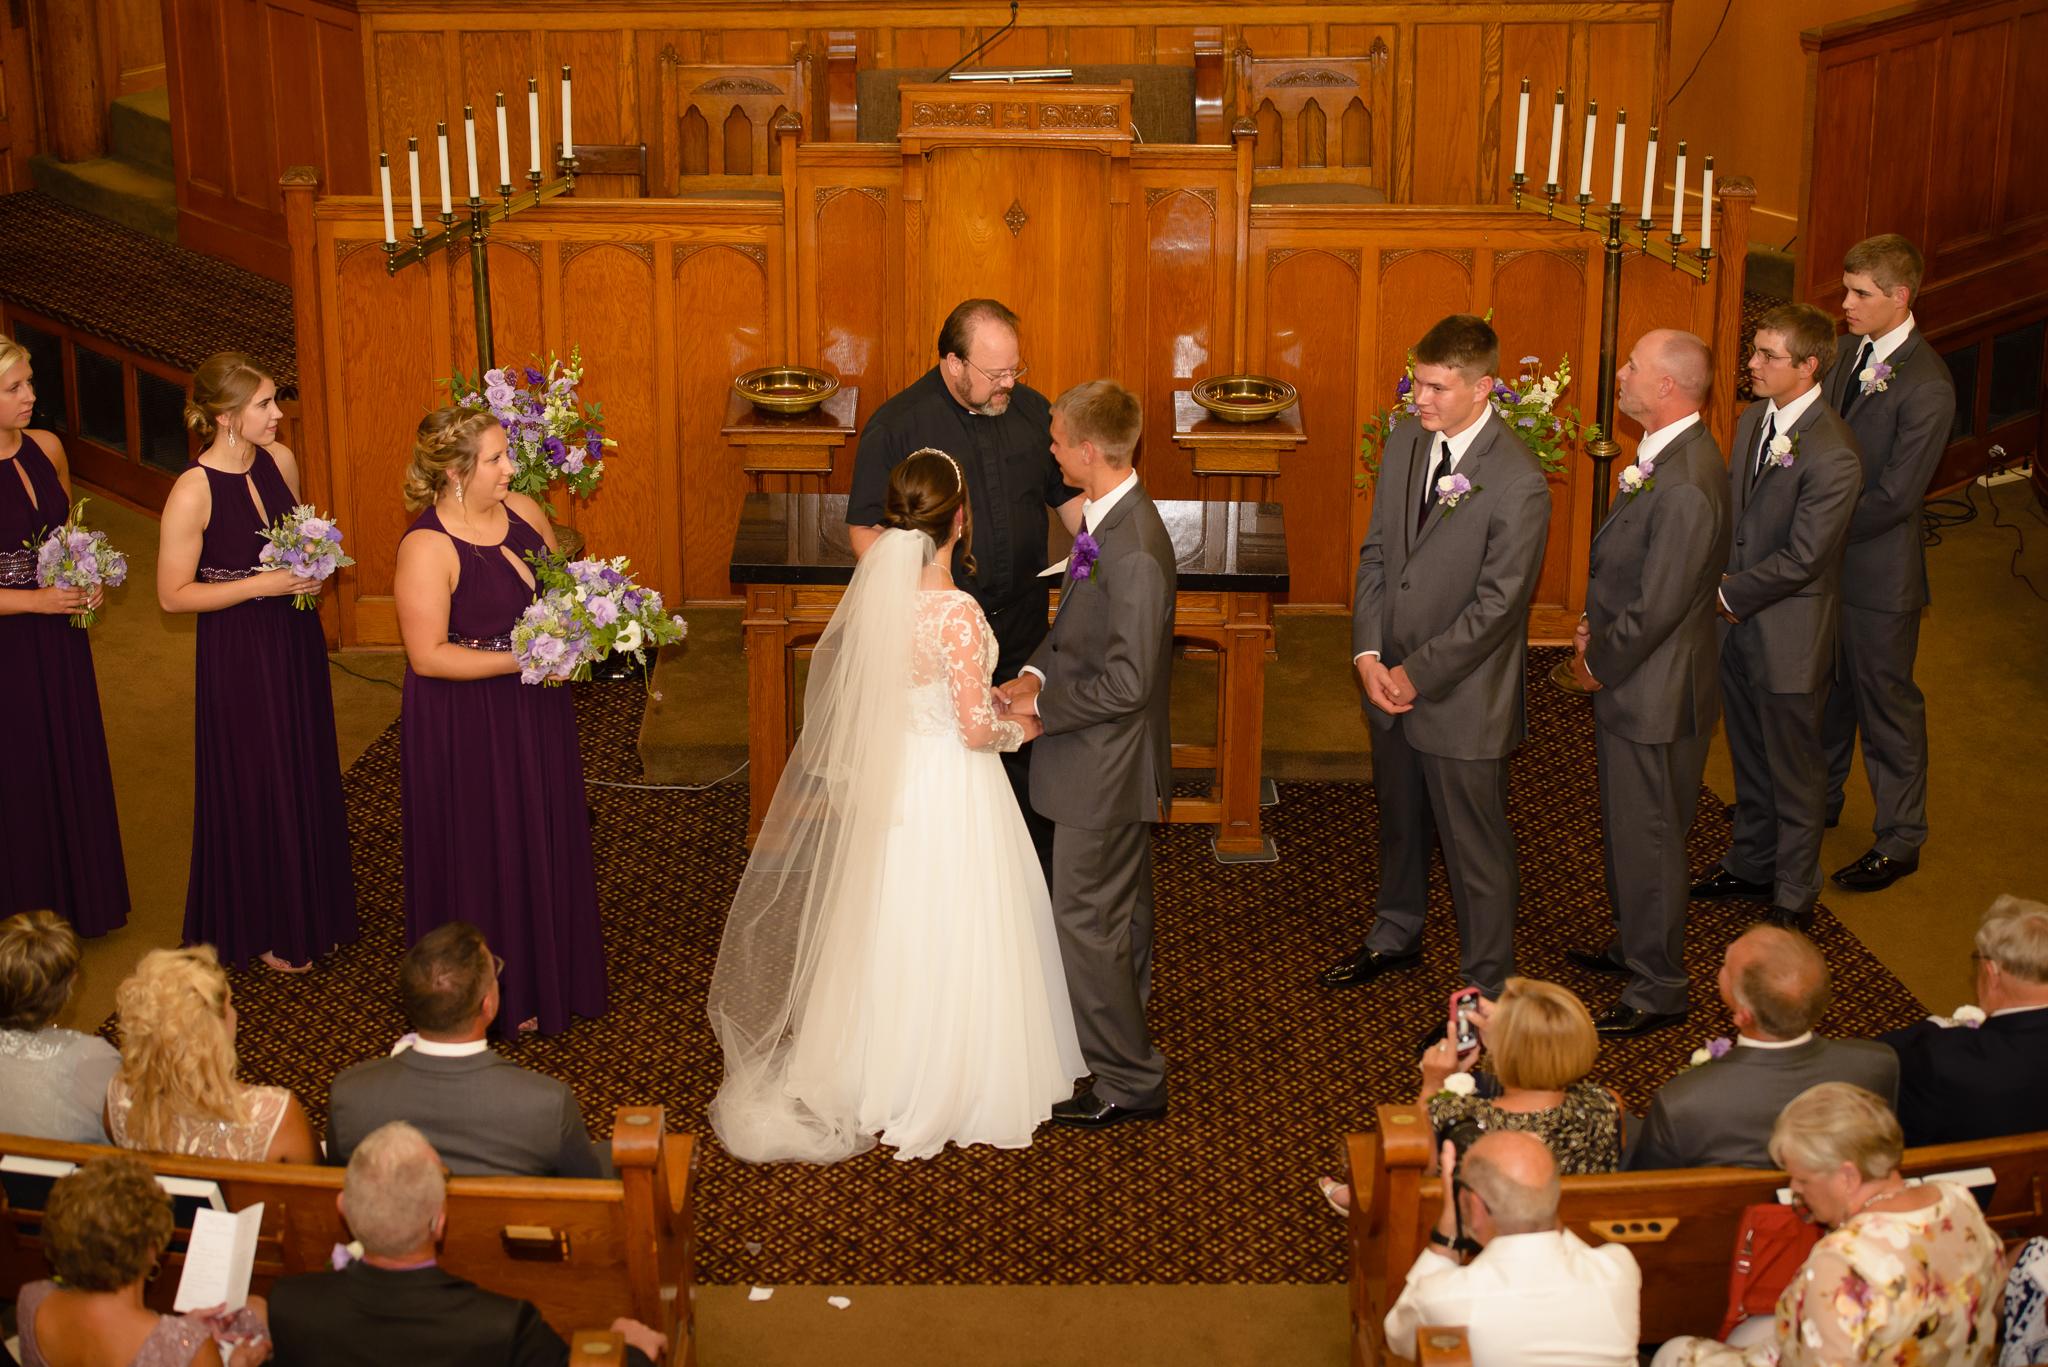 7-ashland washburn wedding photographyDSC_3684.jpg